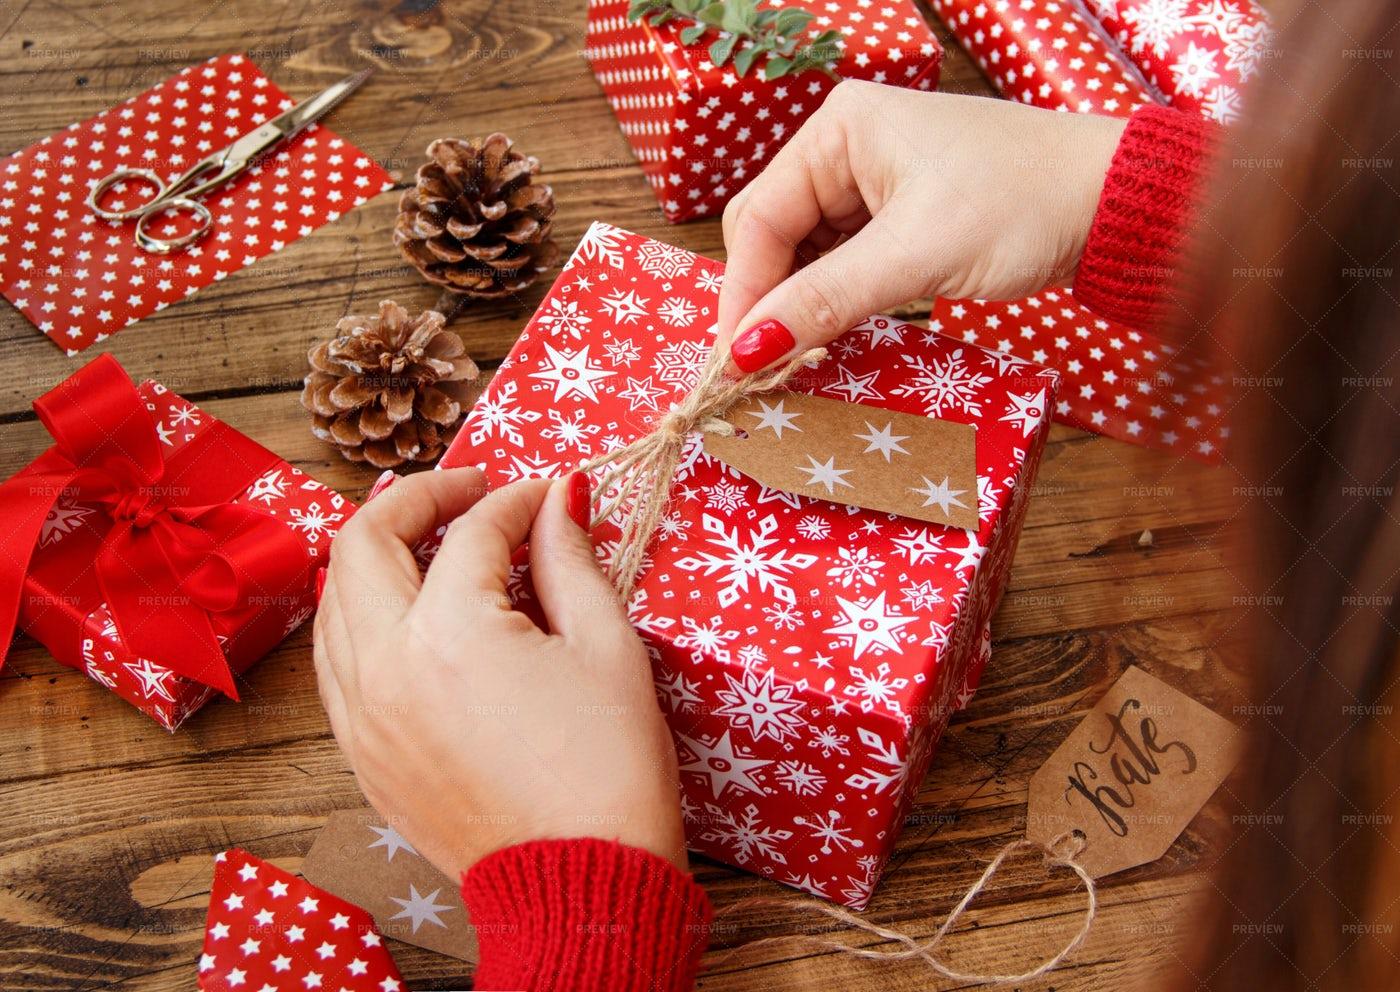 Woman Wrapping A Christmas Present: Stock Photos